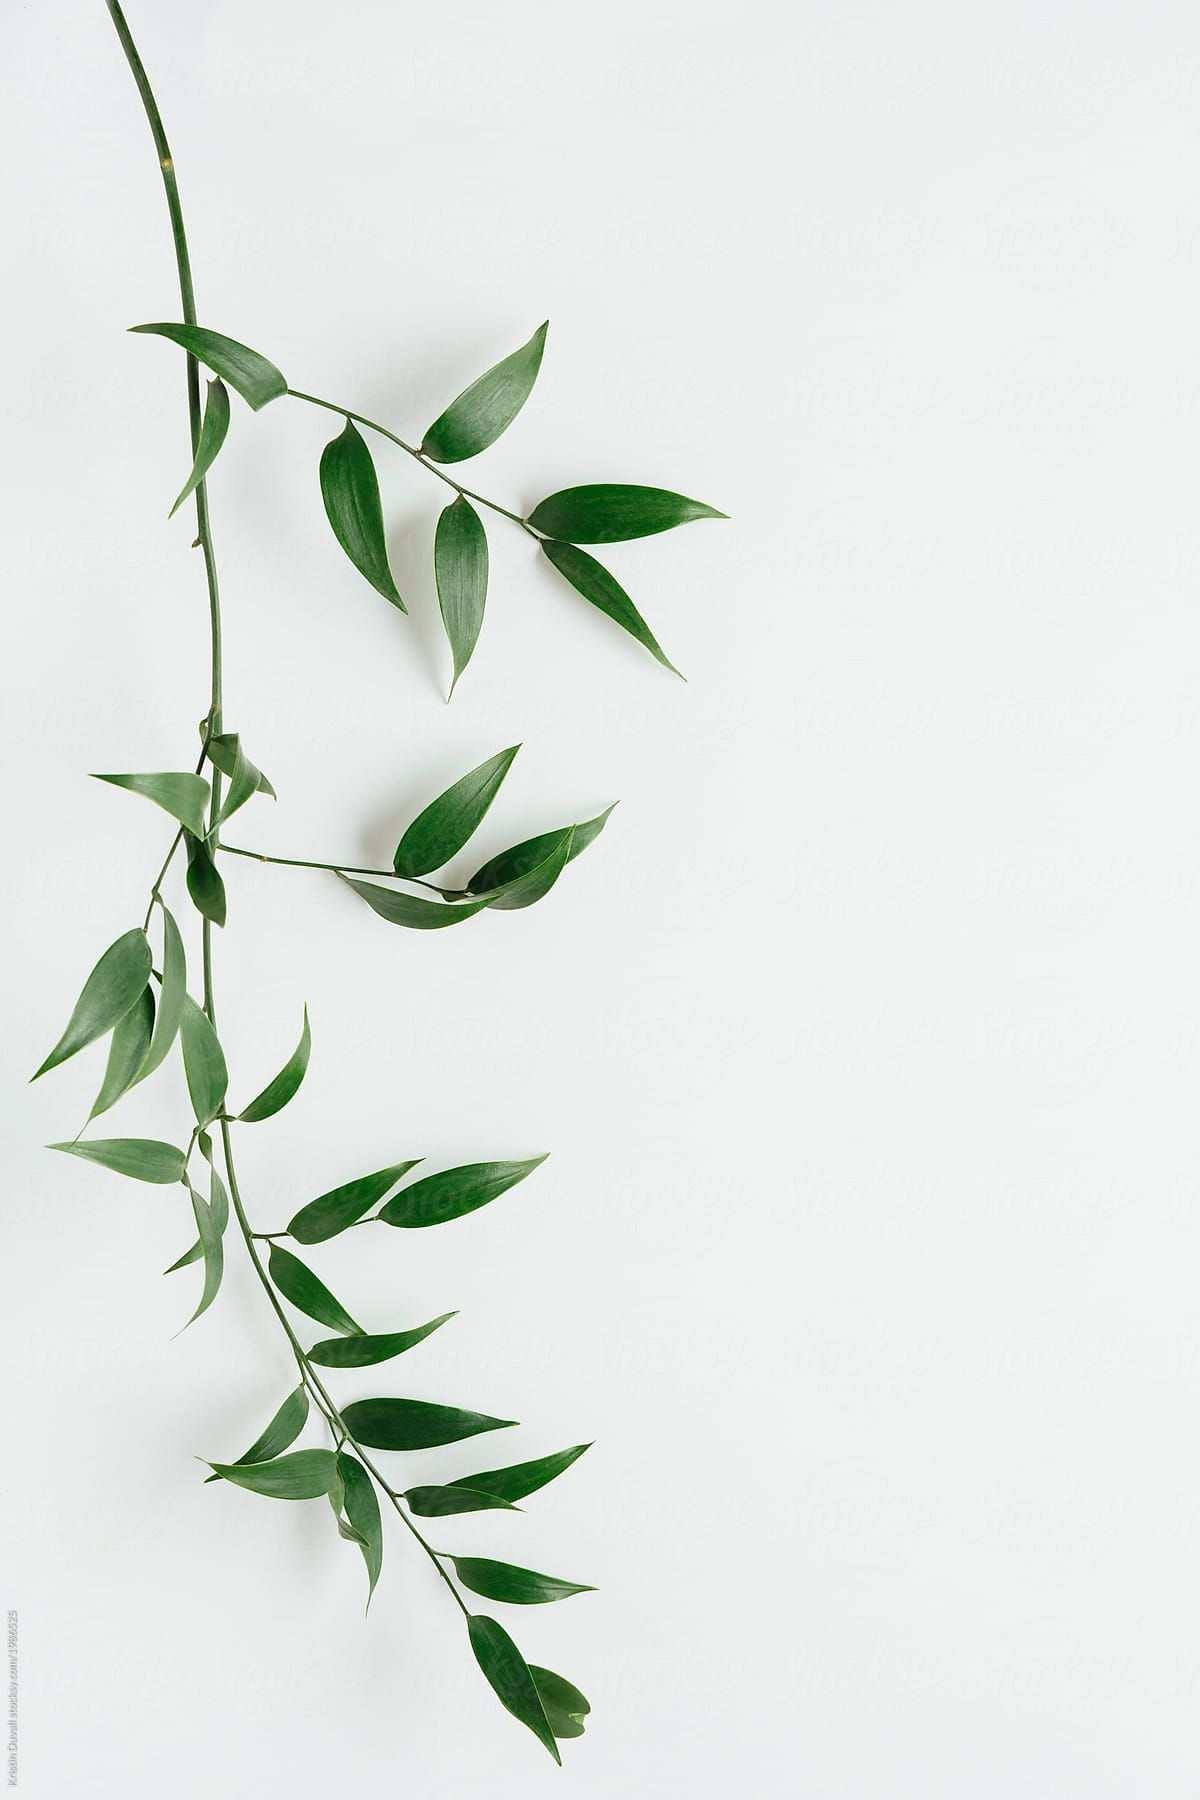 Italian Ruscus Leaves On White Leaf Photography Plant Wallpaper Flower Background Wallpaper